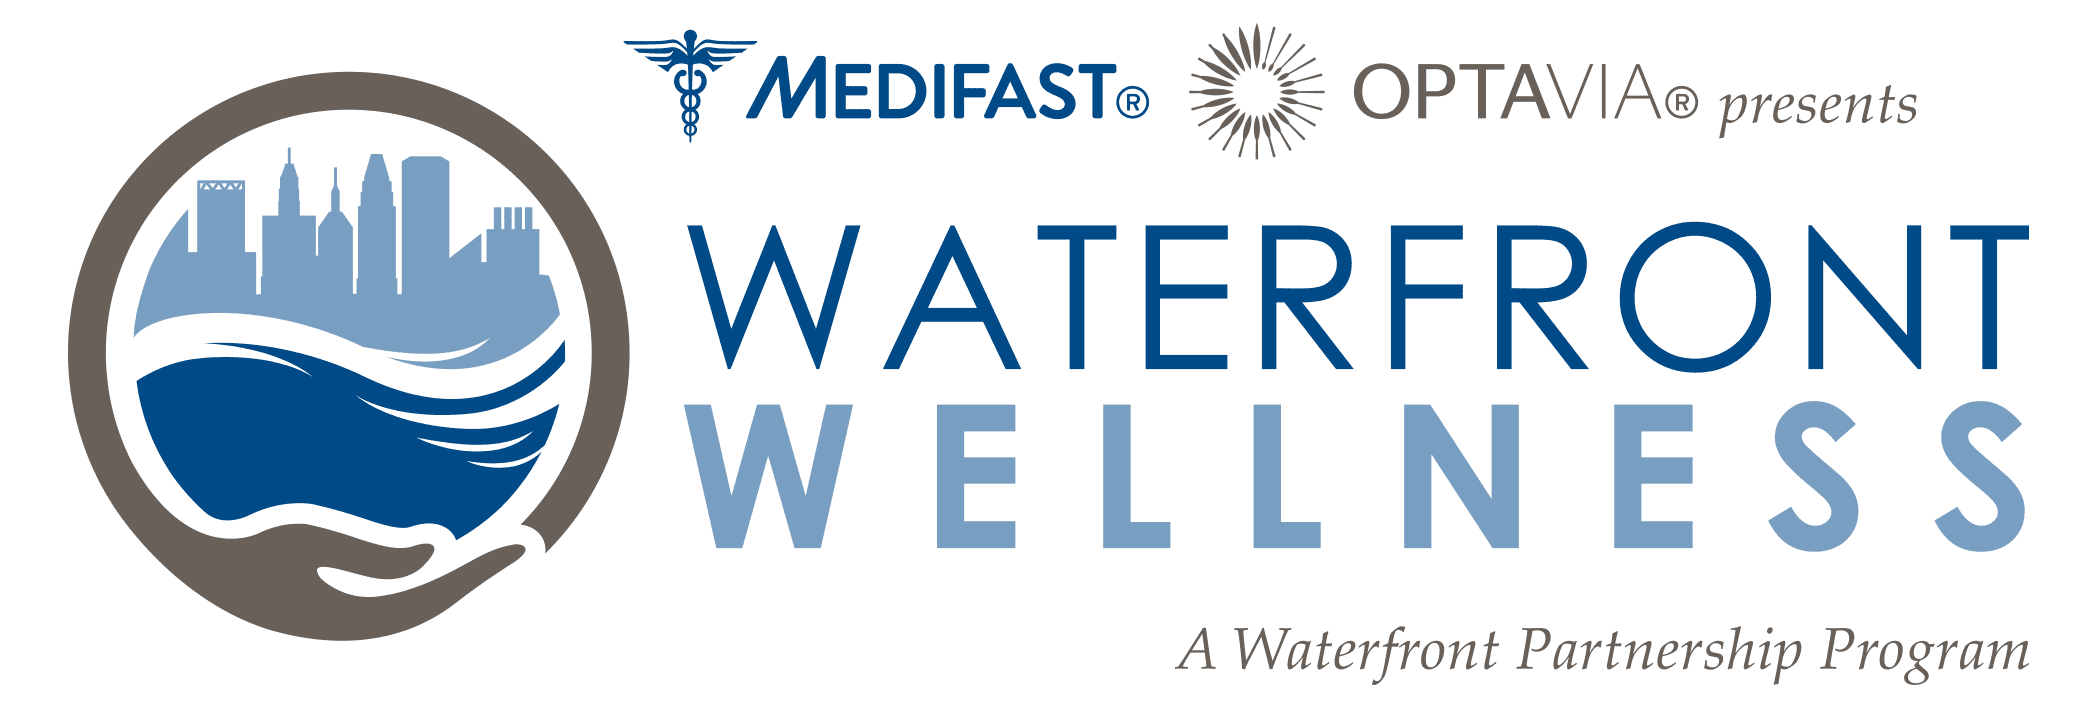 MedifastOPTAVIA_WaterfrontWellness_Logo